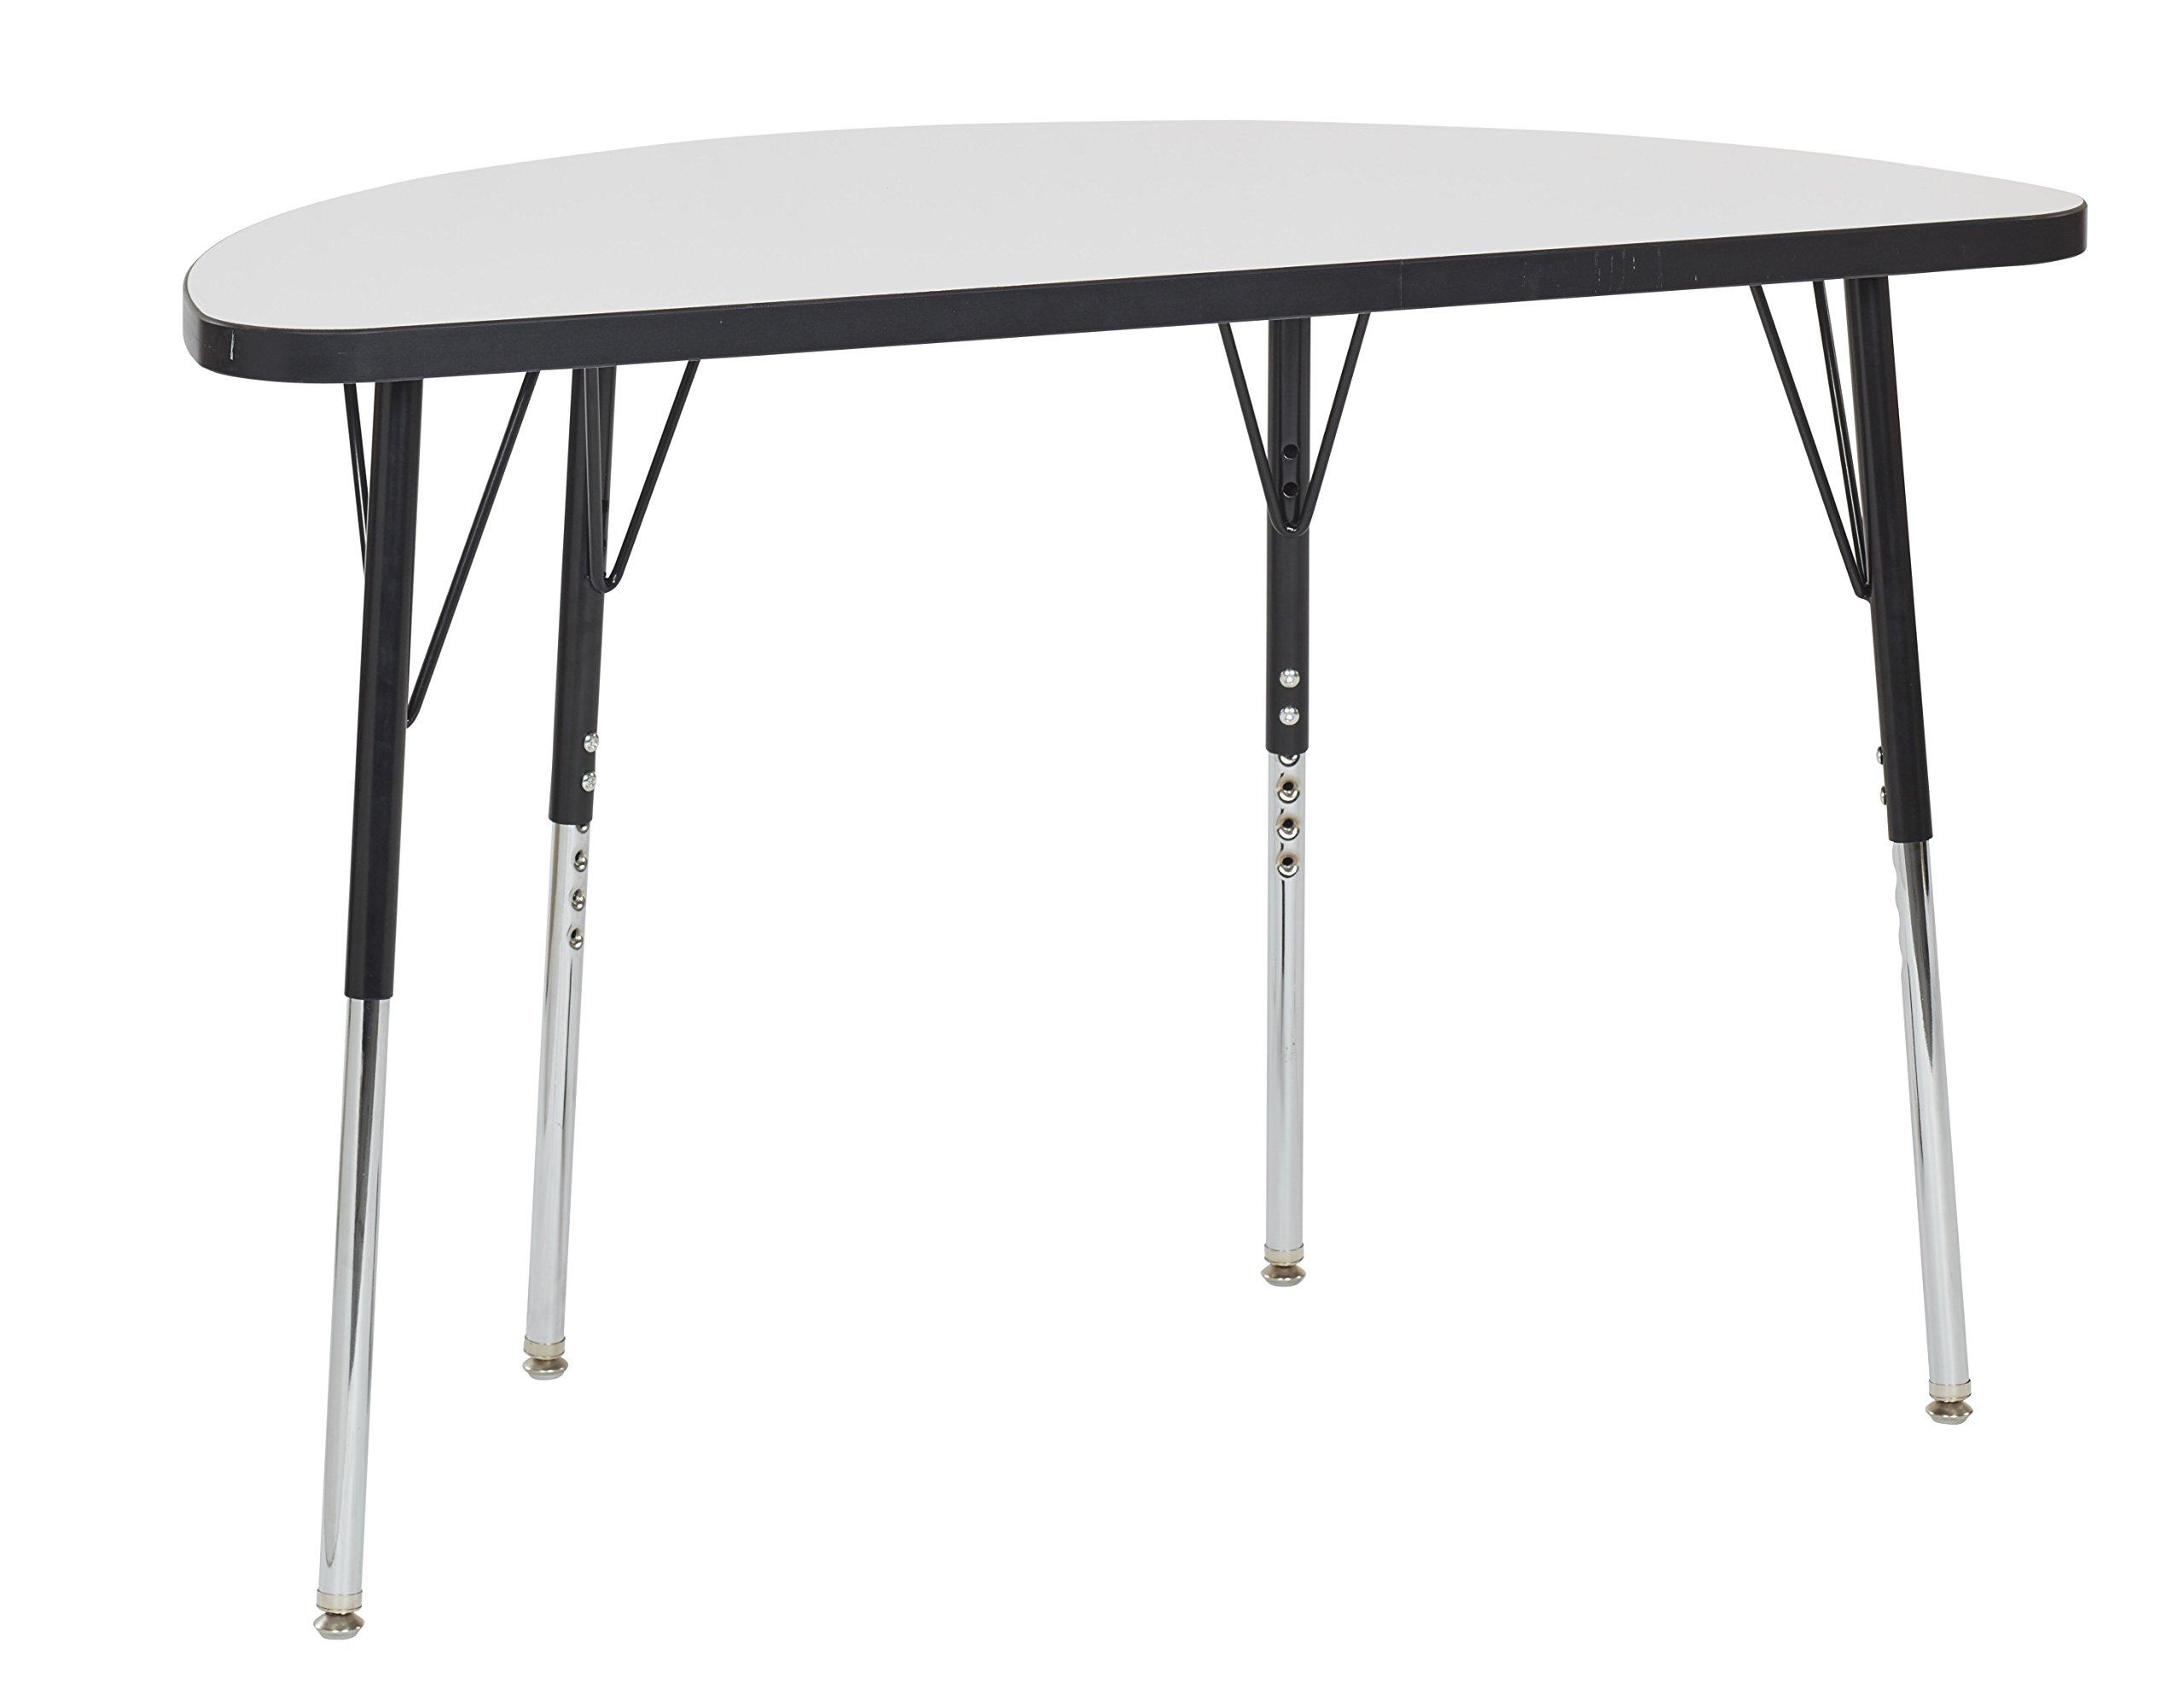 ECR4Kids Mesa Dry-Erase 24'' x 48'' Half Round School Activity Table, Standard Legs w/ Swivel Glides, Adjustable Height 19-30 inch (Black)